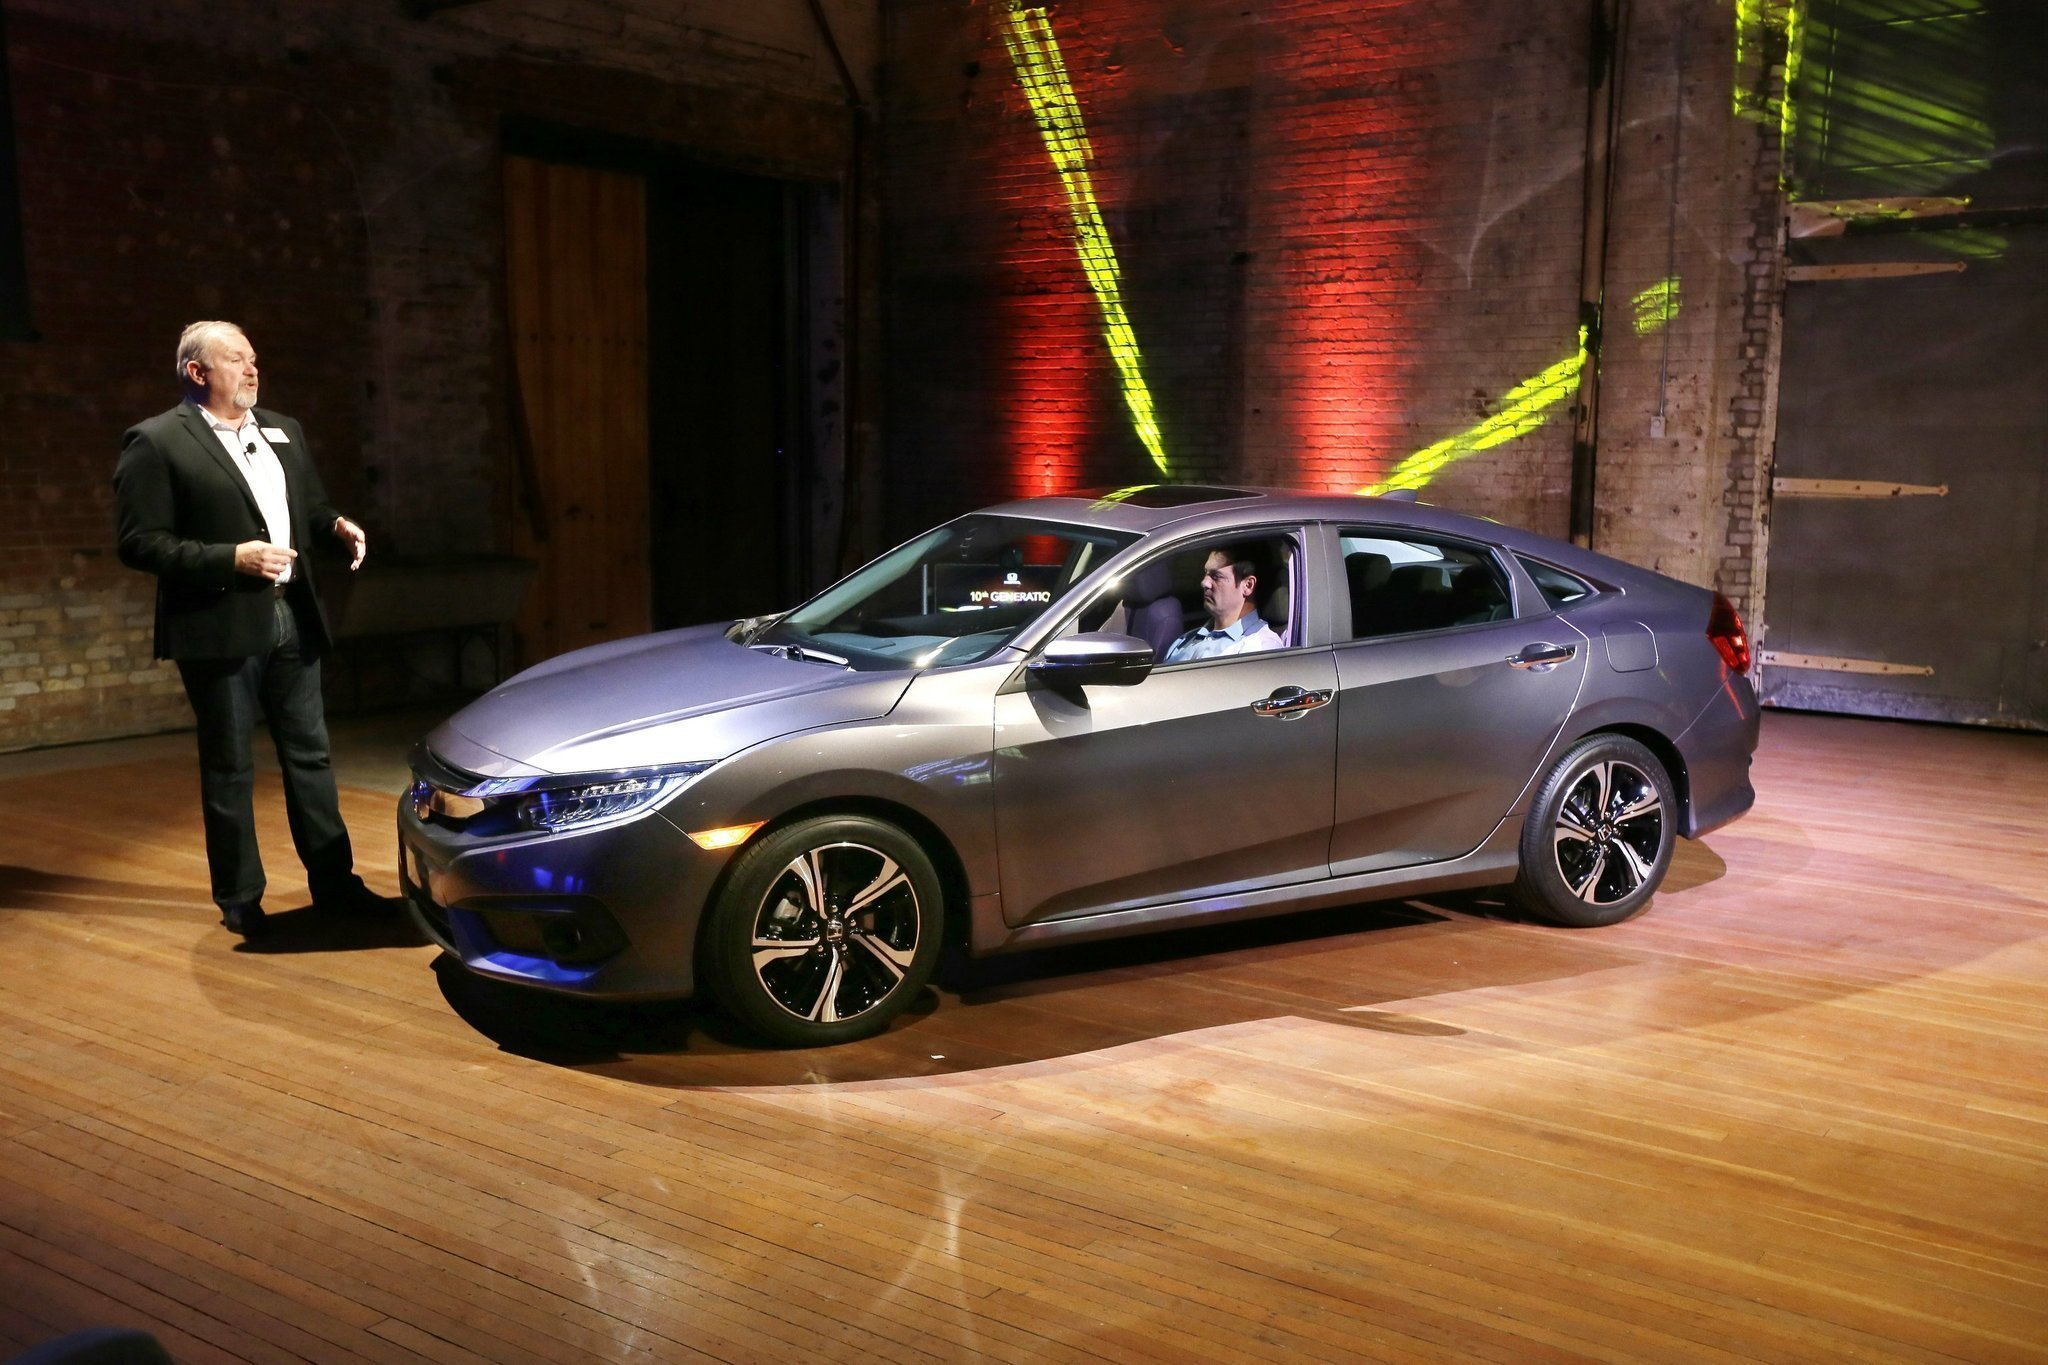 Hondas Popular Civic Gets Successful Overhaul For The San - Overhaul car show